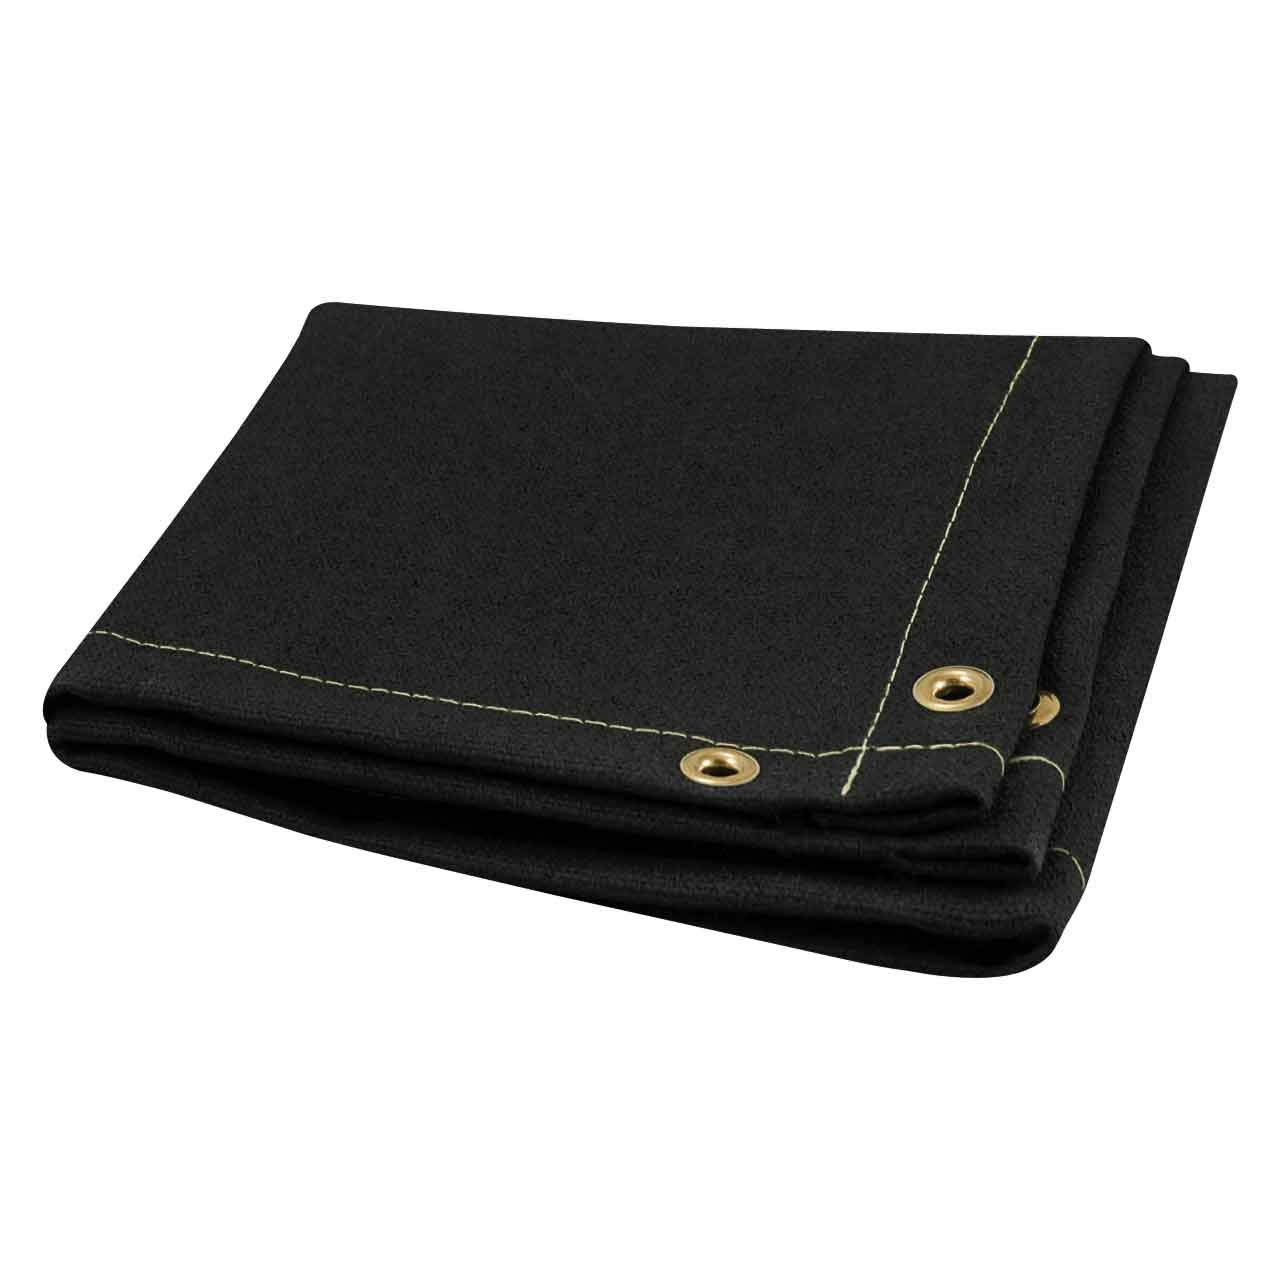 Steiner 376-6X8 Flex 28-Ounce Heavy Acrylic Coated Fiberglass Welding Blanket, Black, 6' x 8' 6' x 8' ERB